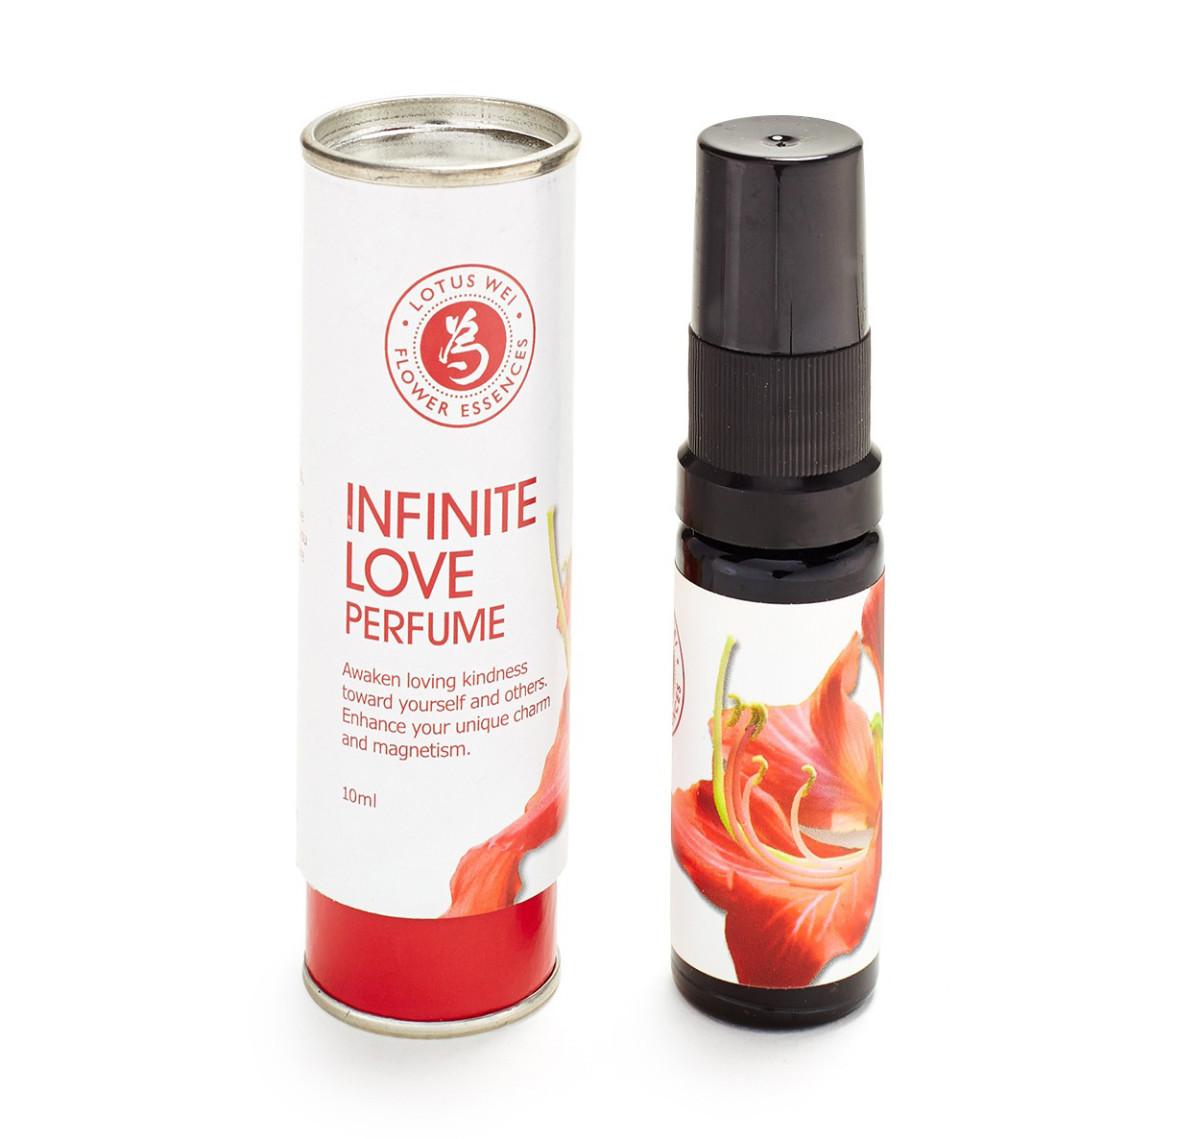 Lotus Wei Infinite Love Perfume